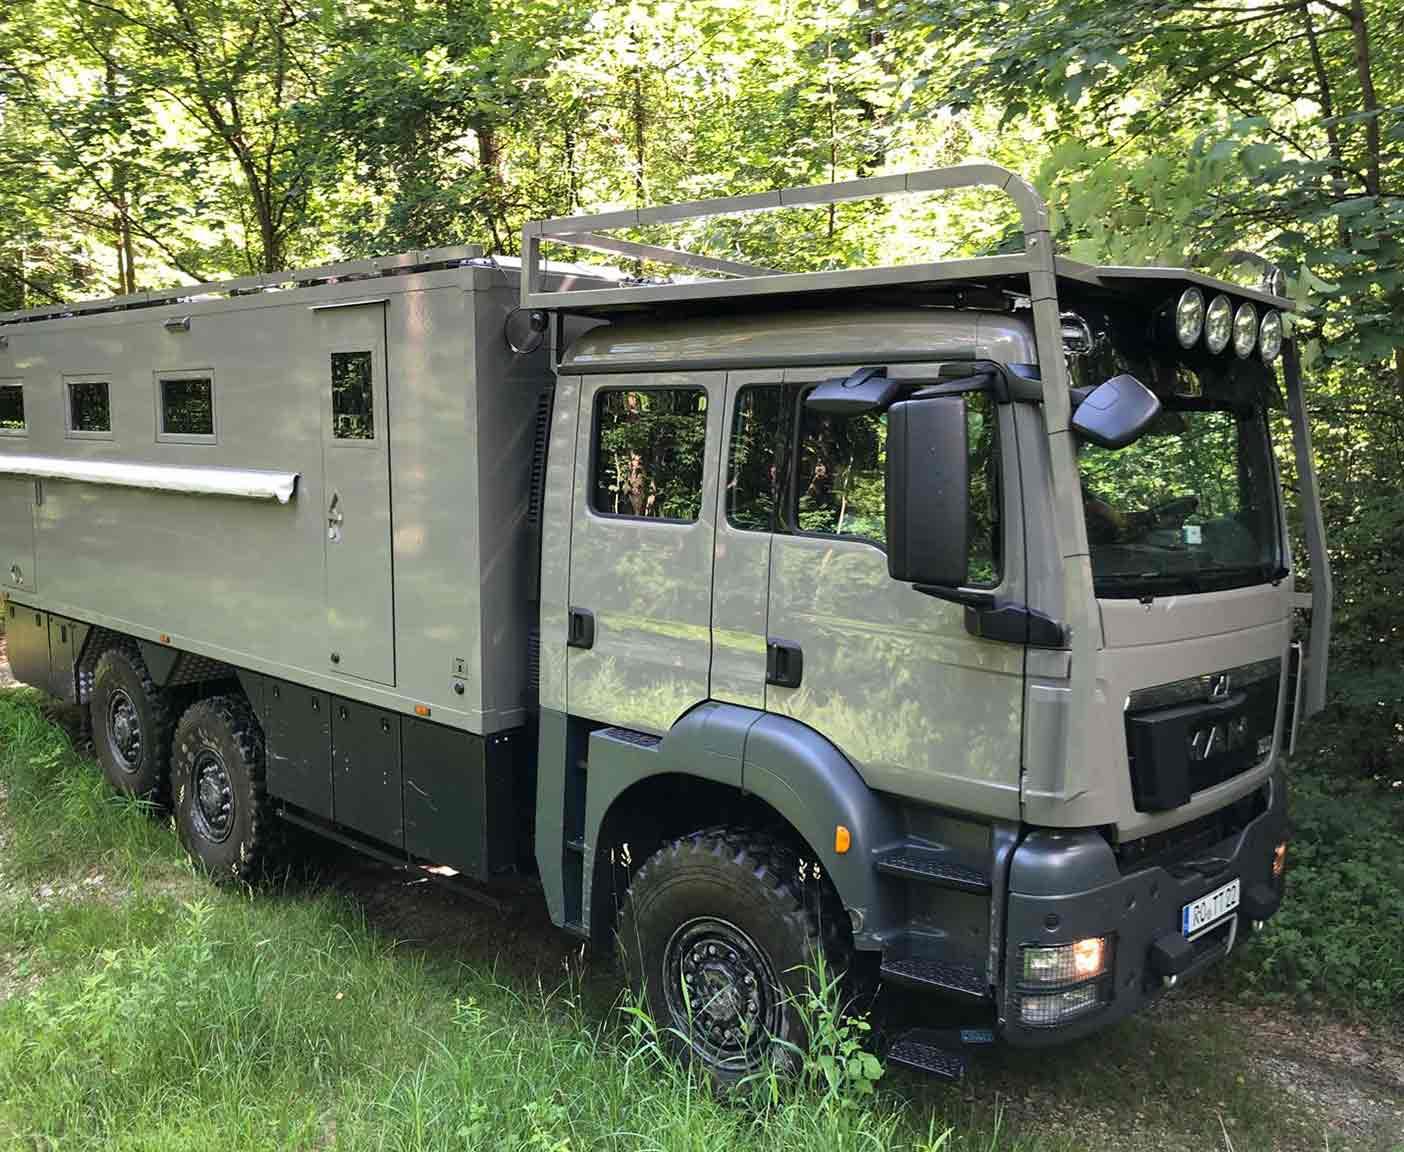 Man-tgs-kipper-truck-4x4-expeditionsmobil-2019